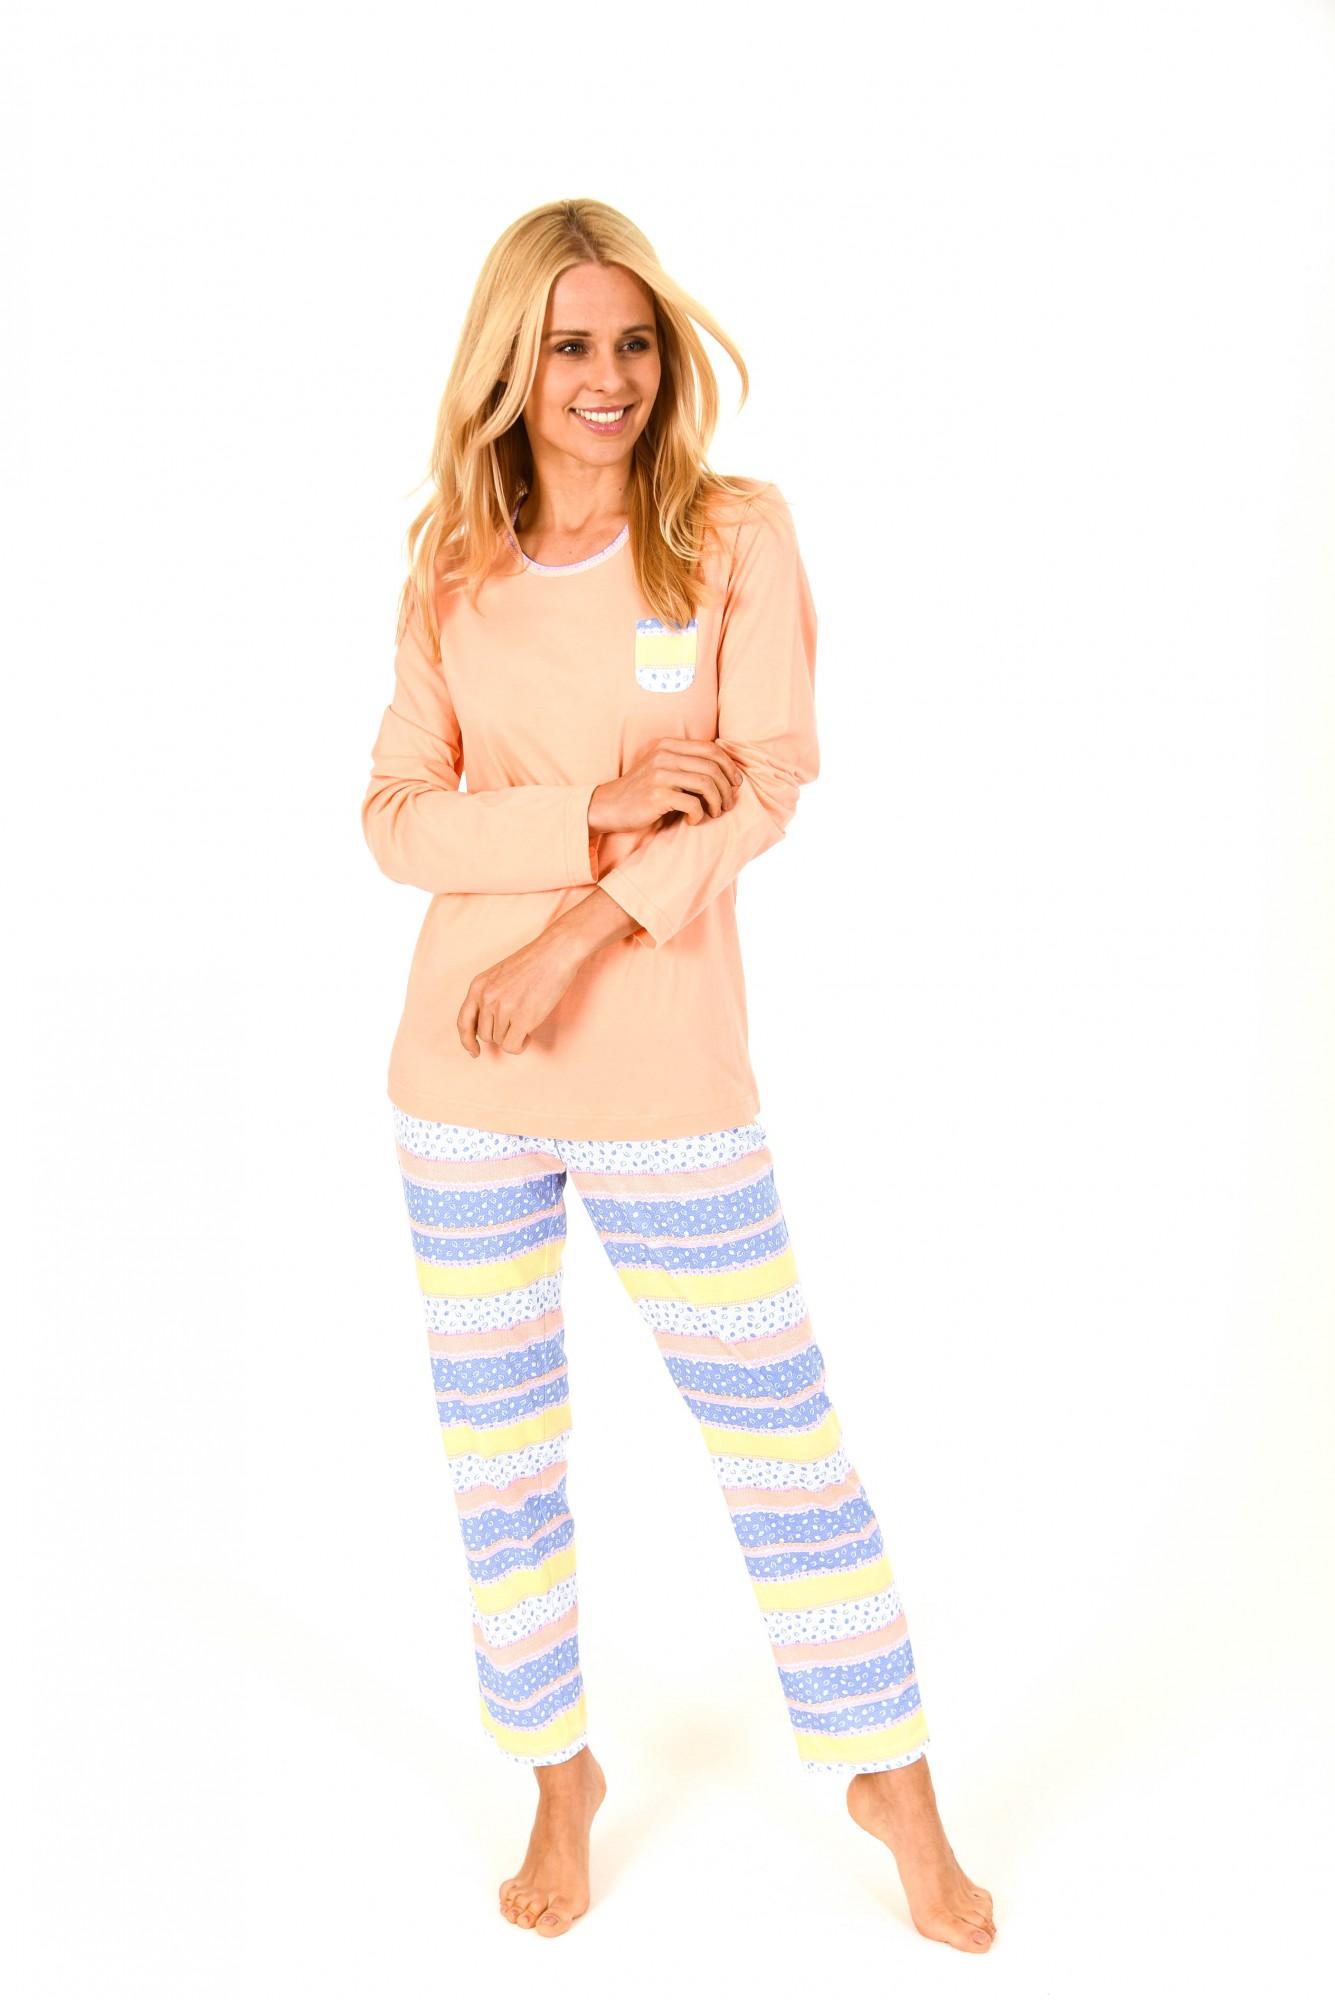 Schöner Damen Pyjama langarm in toller Optik – 171 201 90 815 001